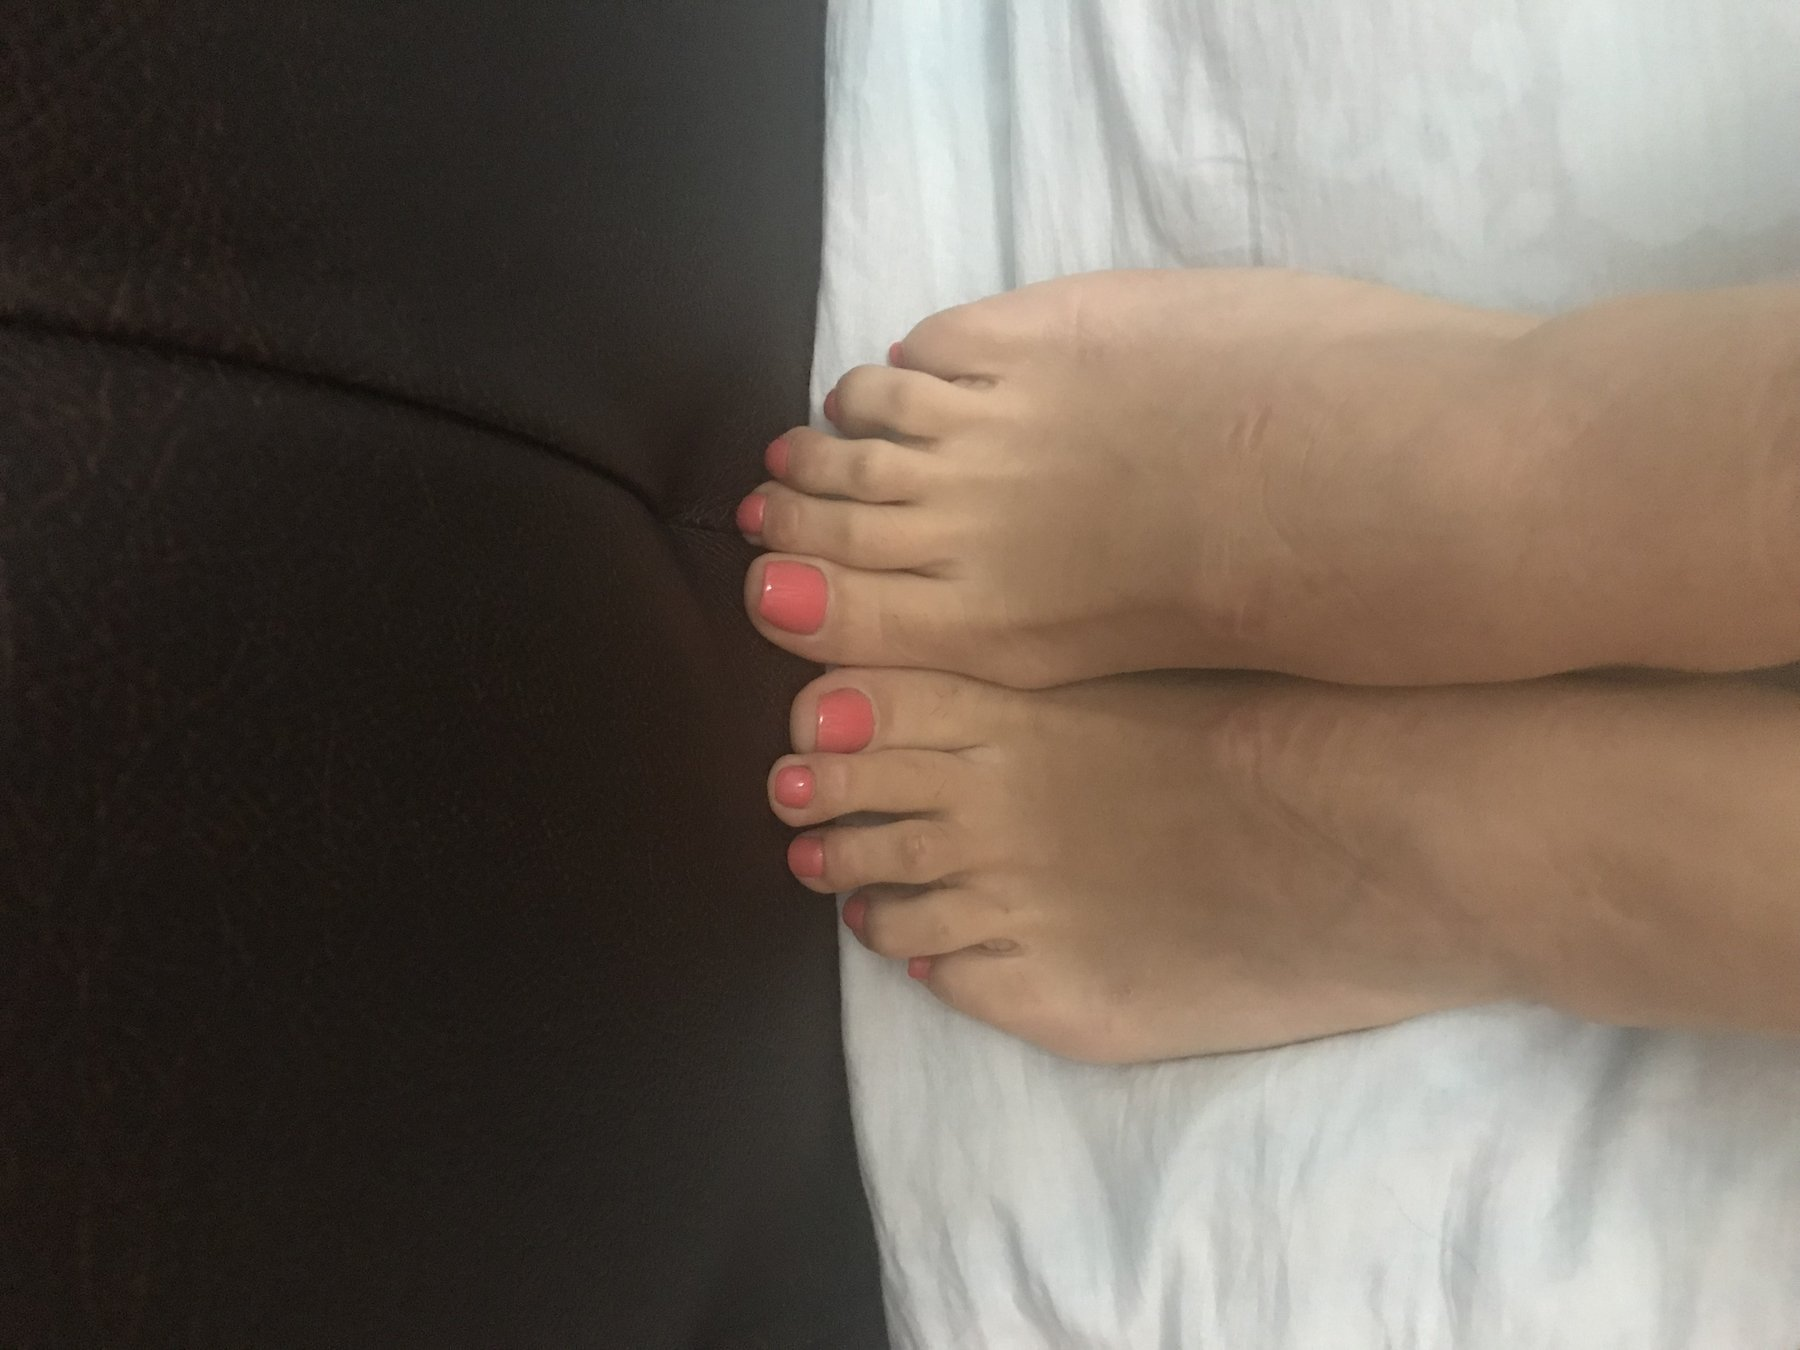 Brown shower fetish pics